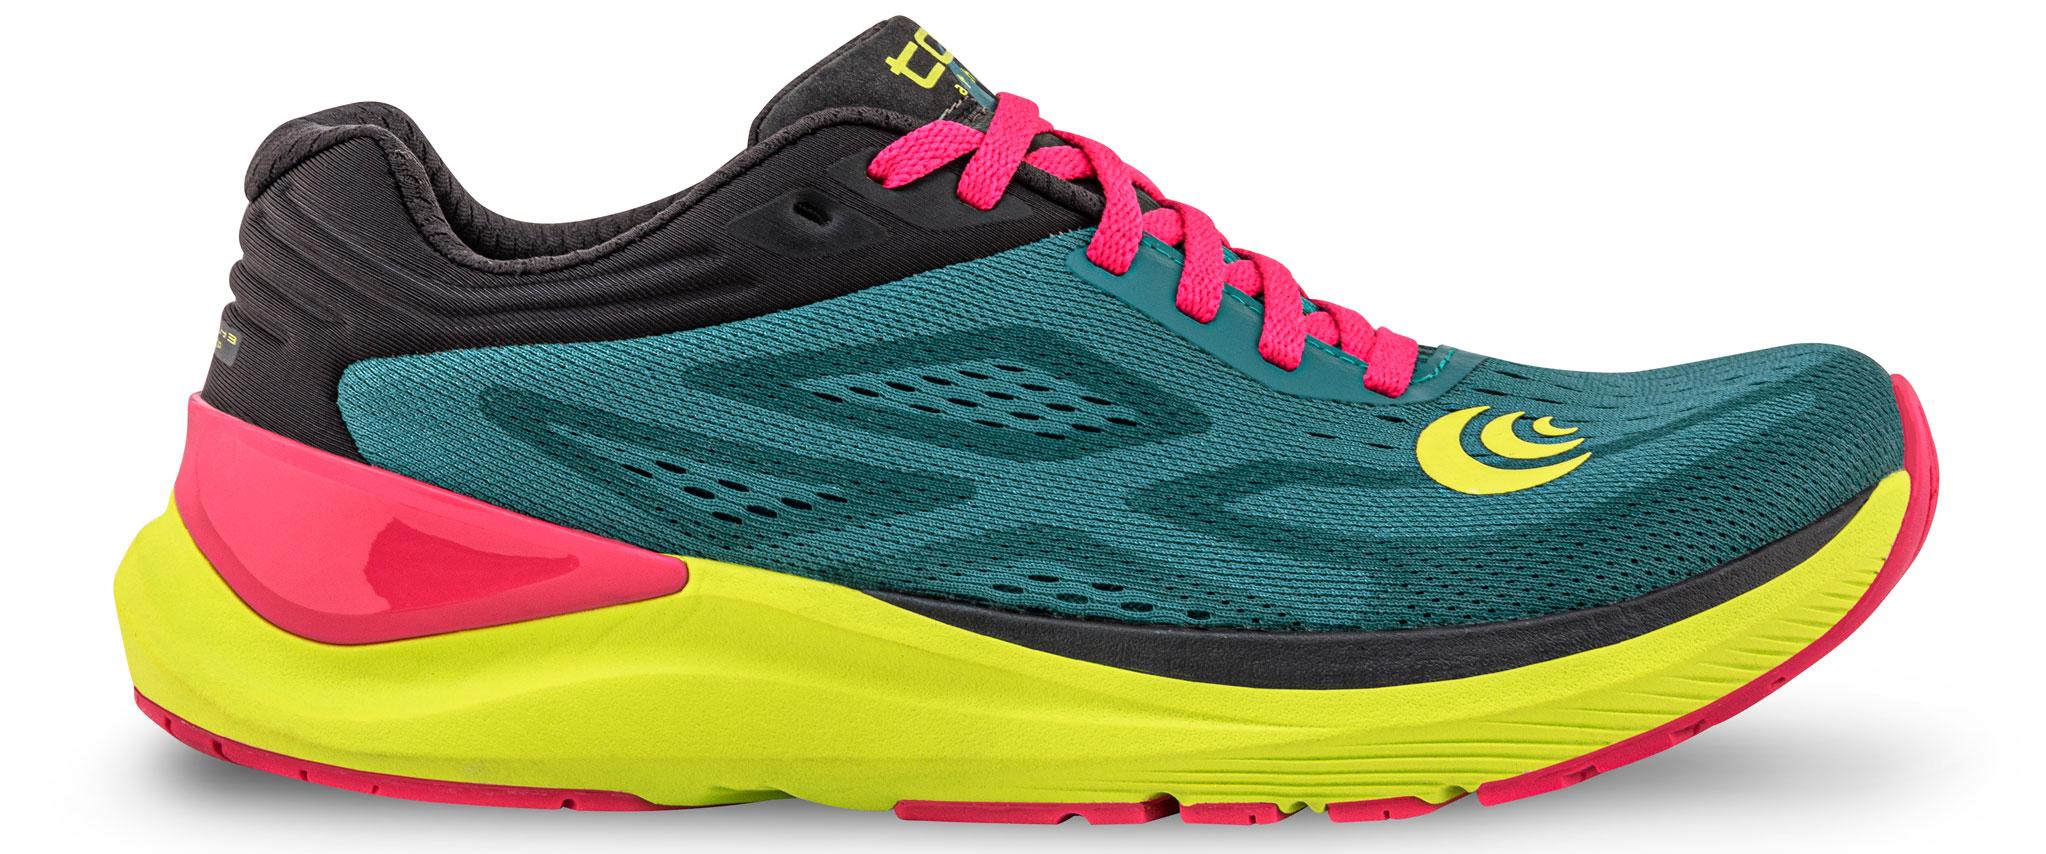 Topo Ultrafly running shoe